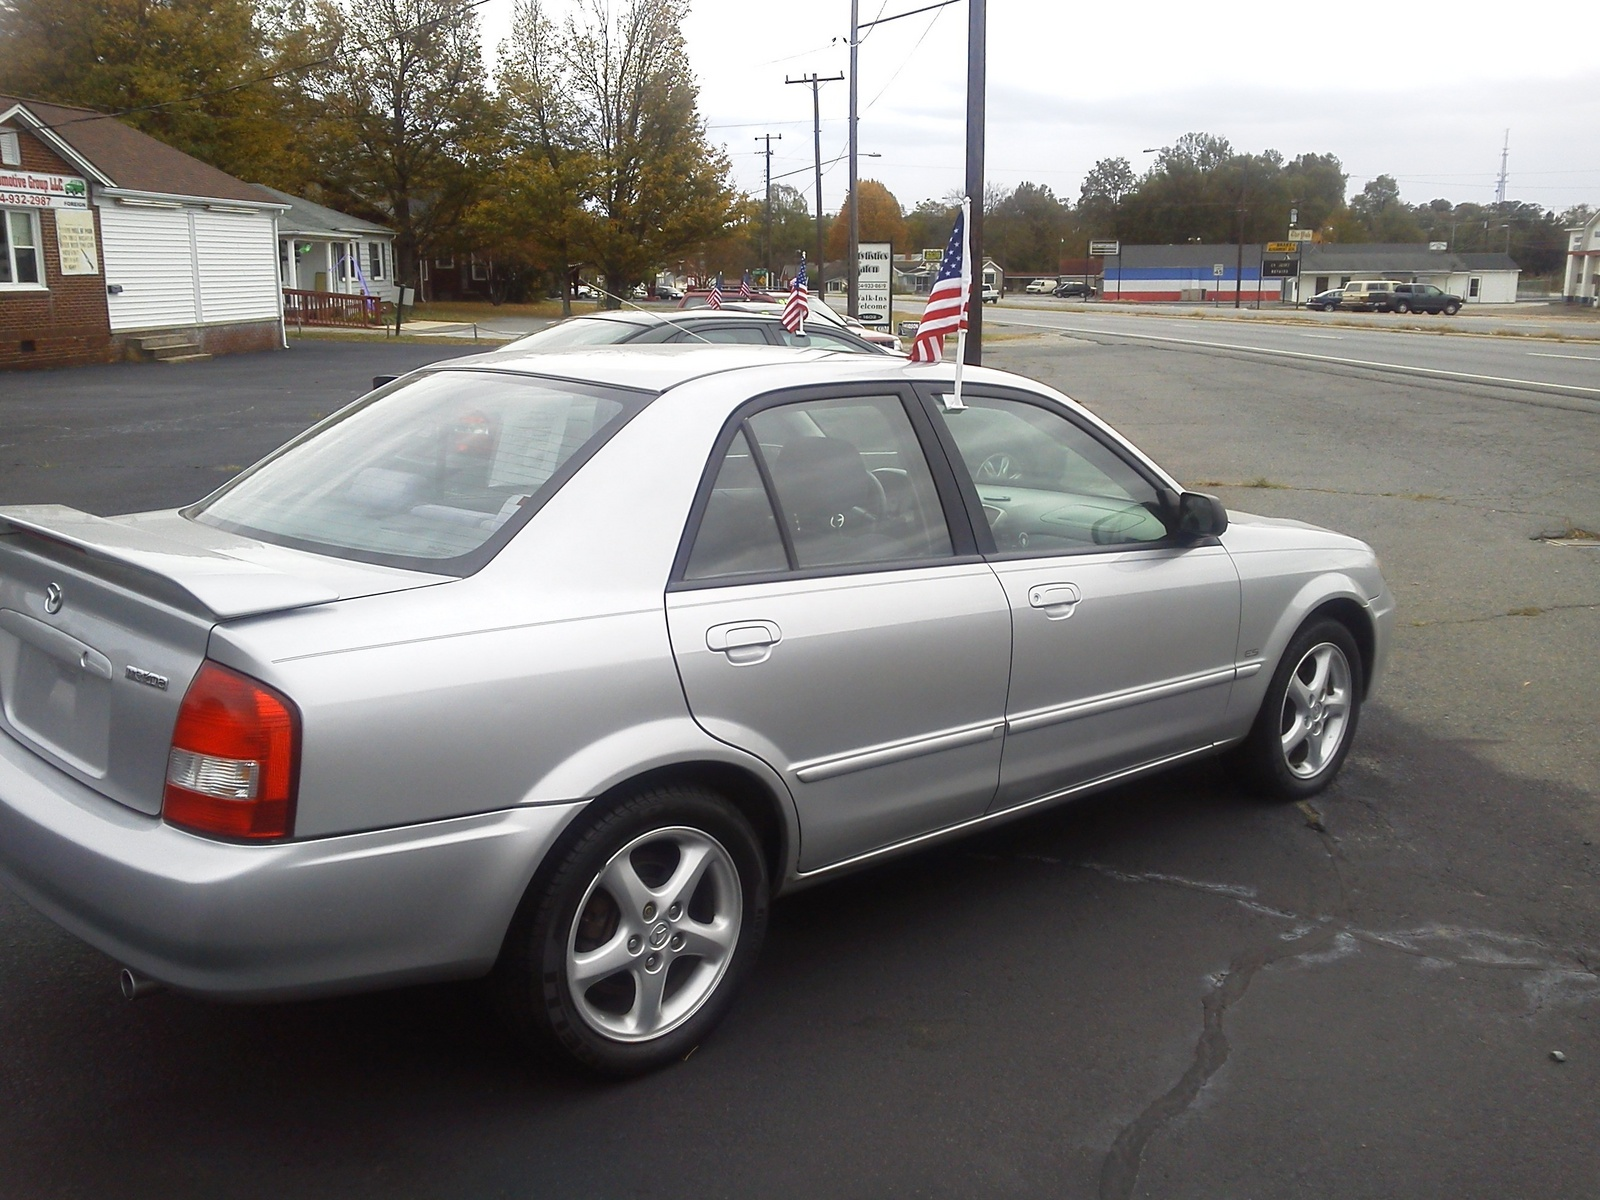 2002 Mazda Protege - Pictures